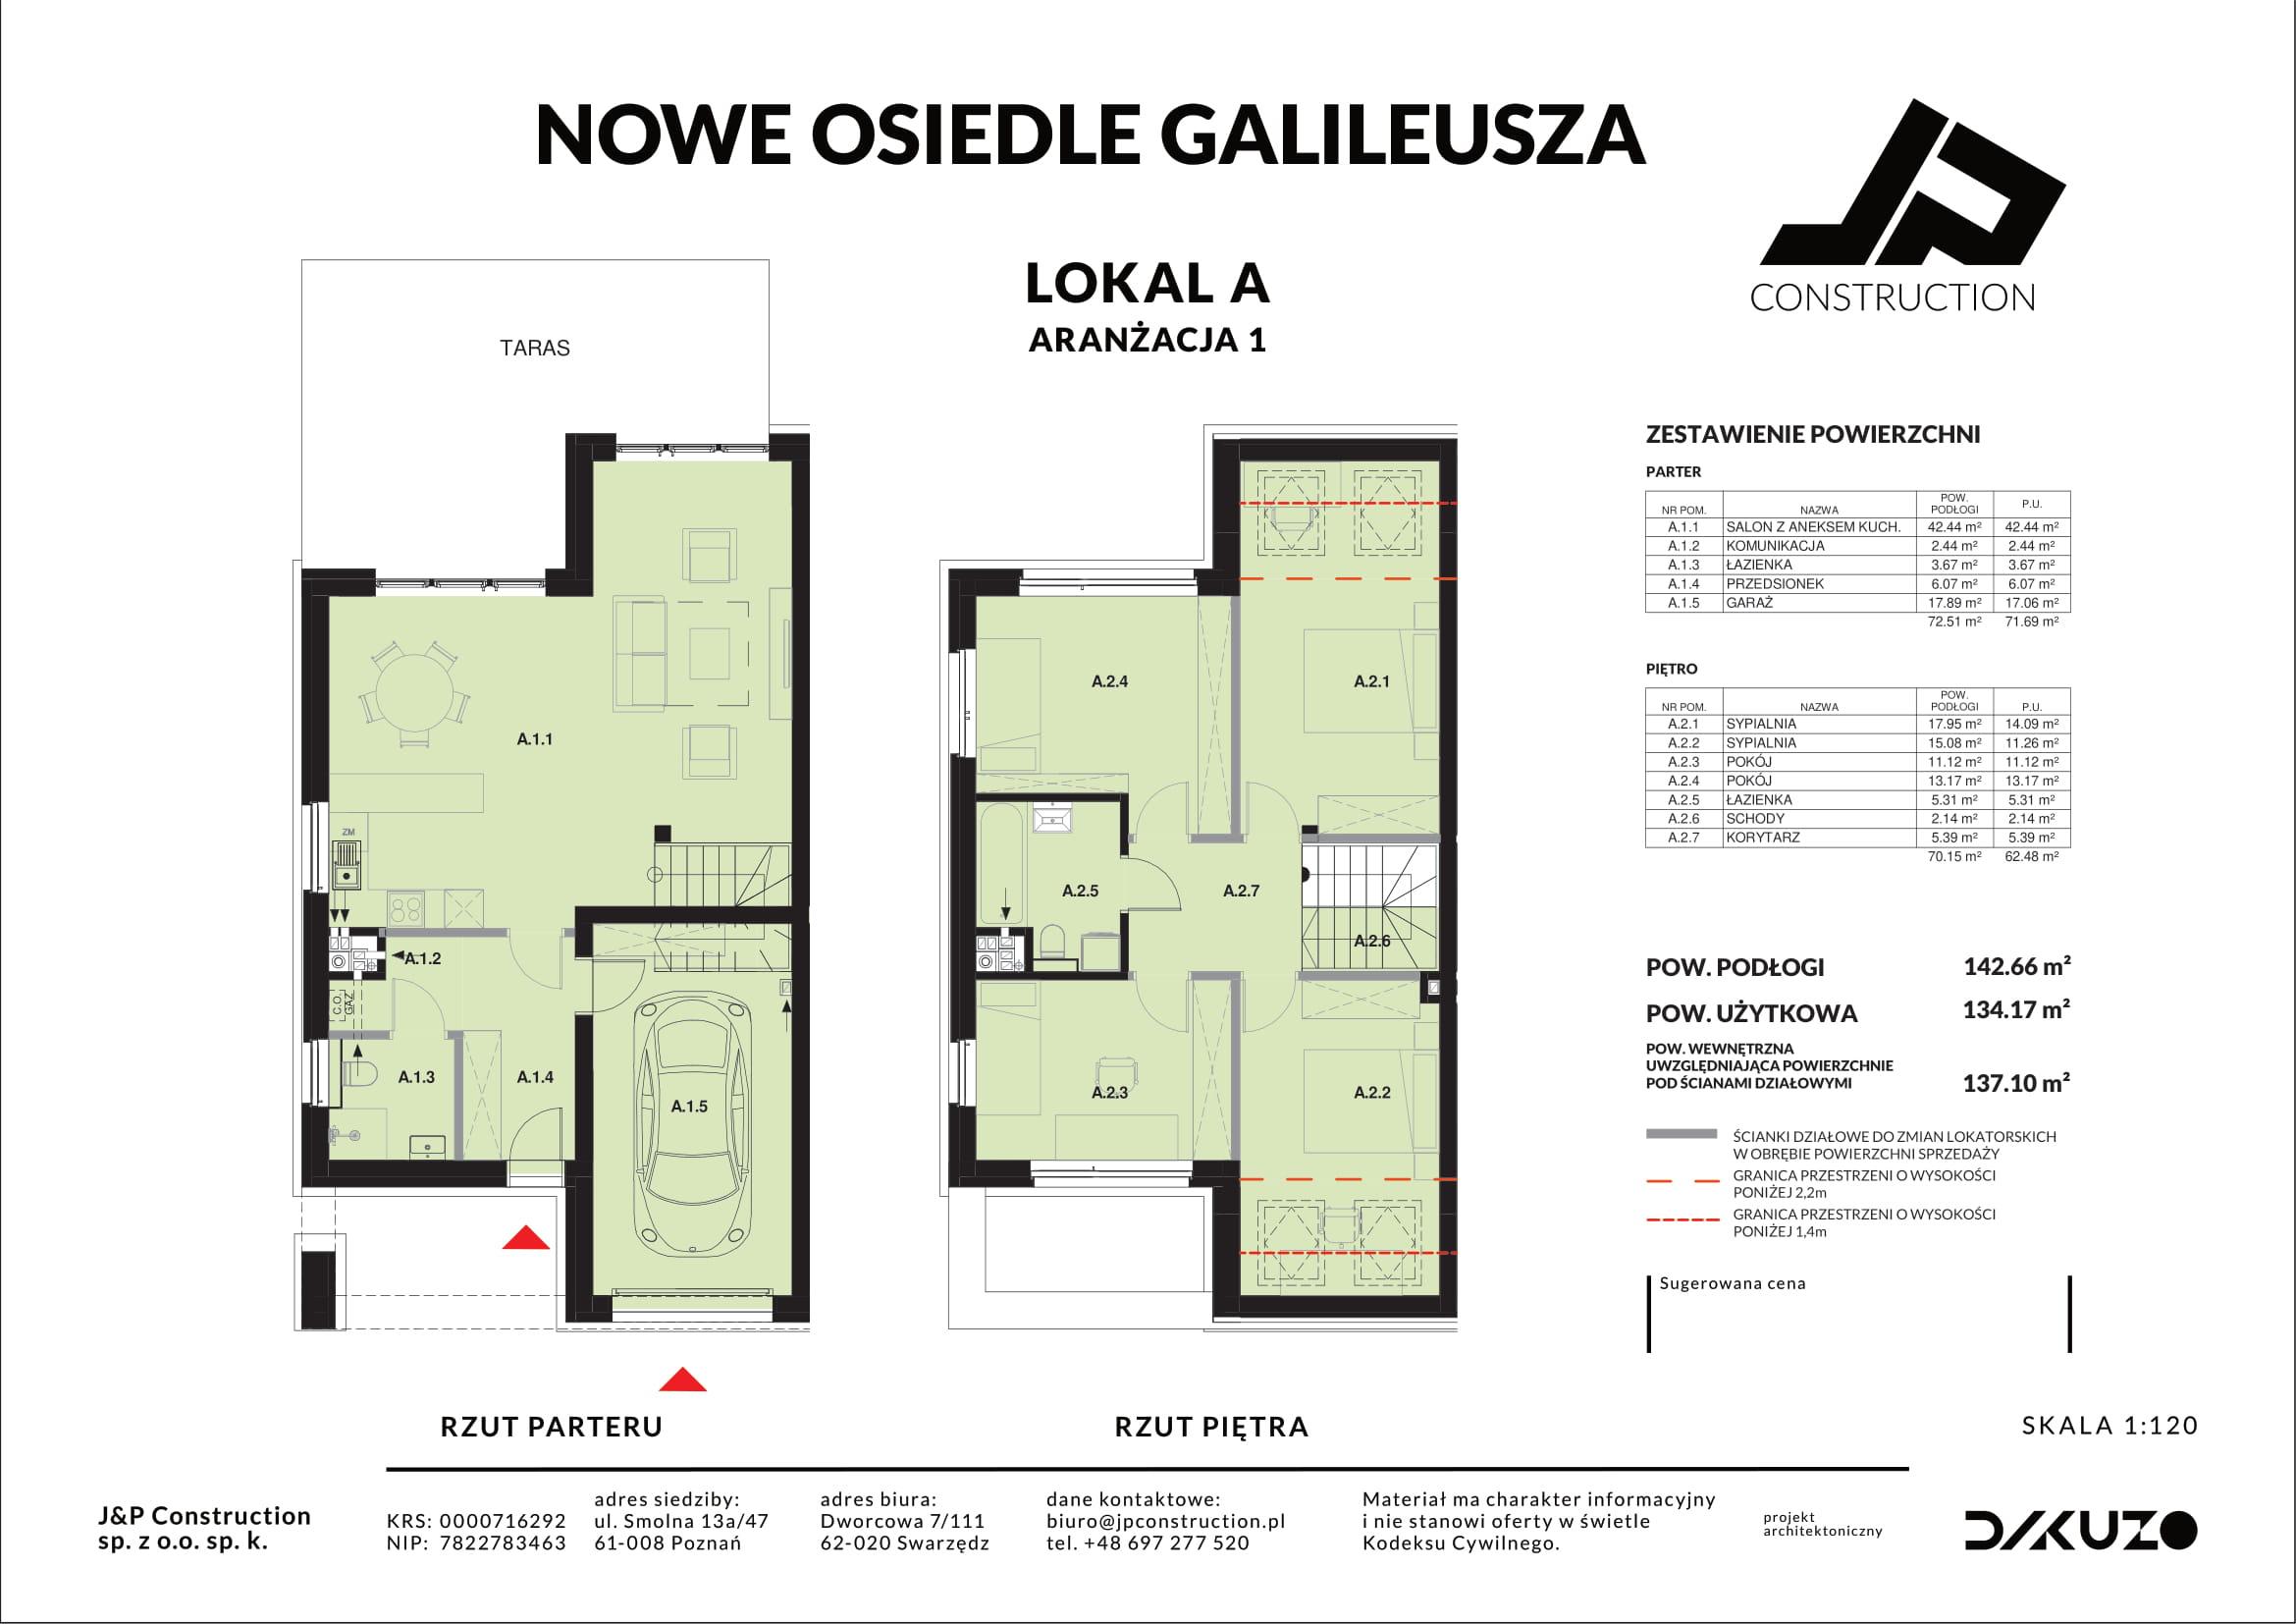 ZALASEWO-GAL-KARTA-LOKAL-A-aranzacja-1-1